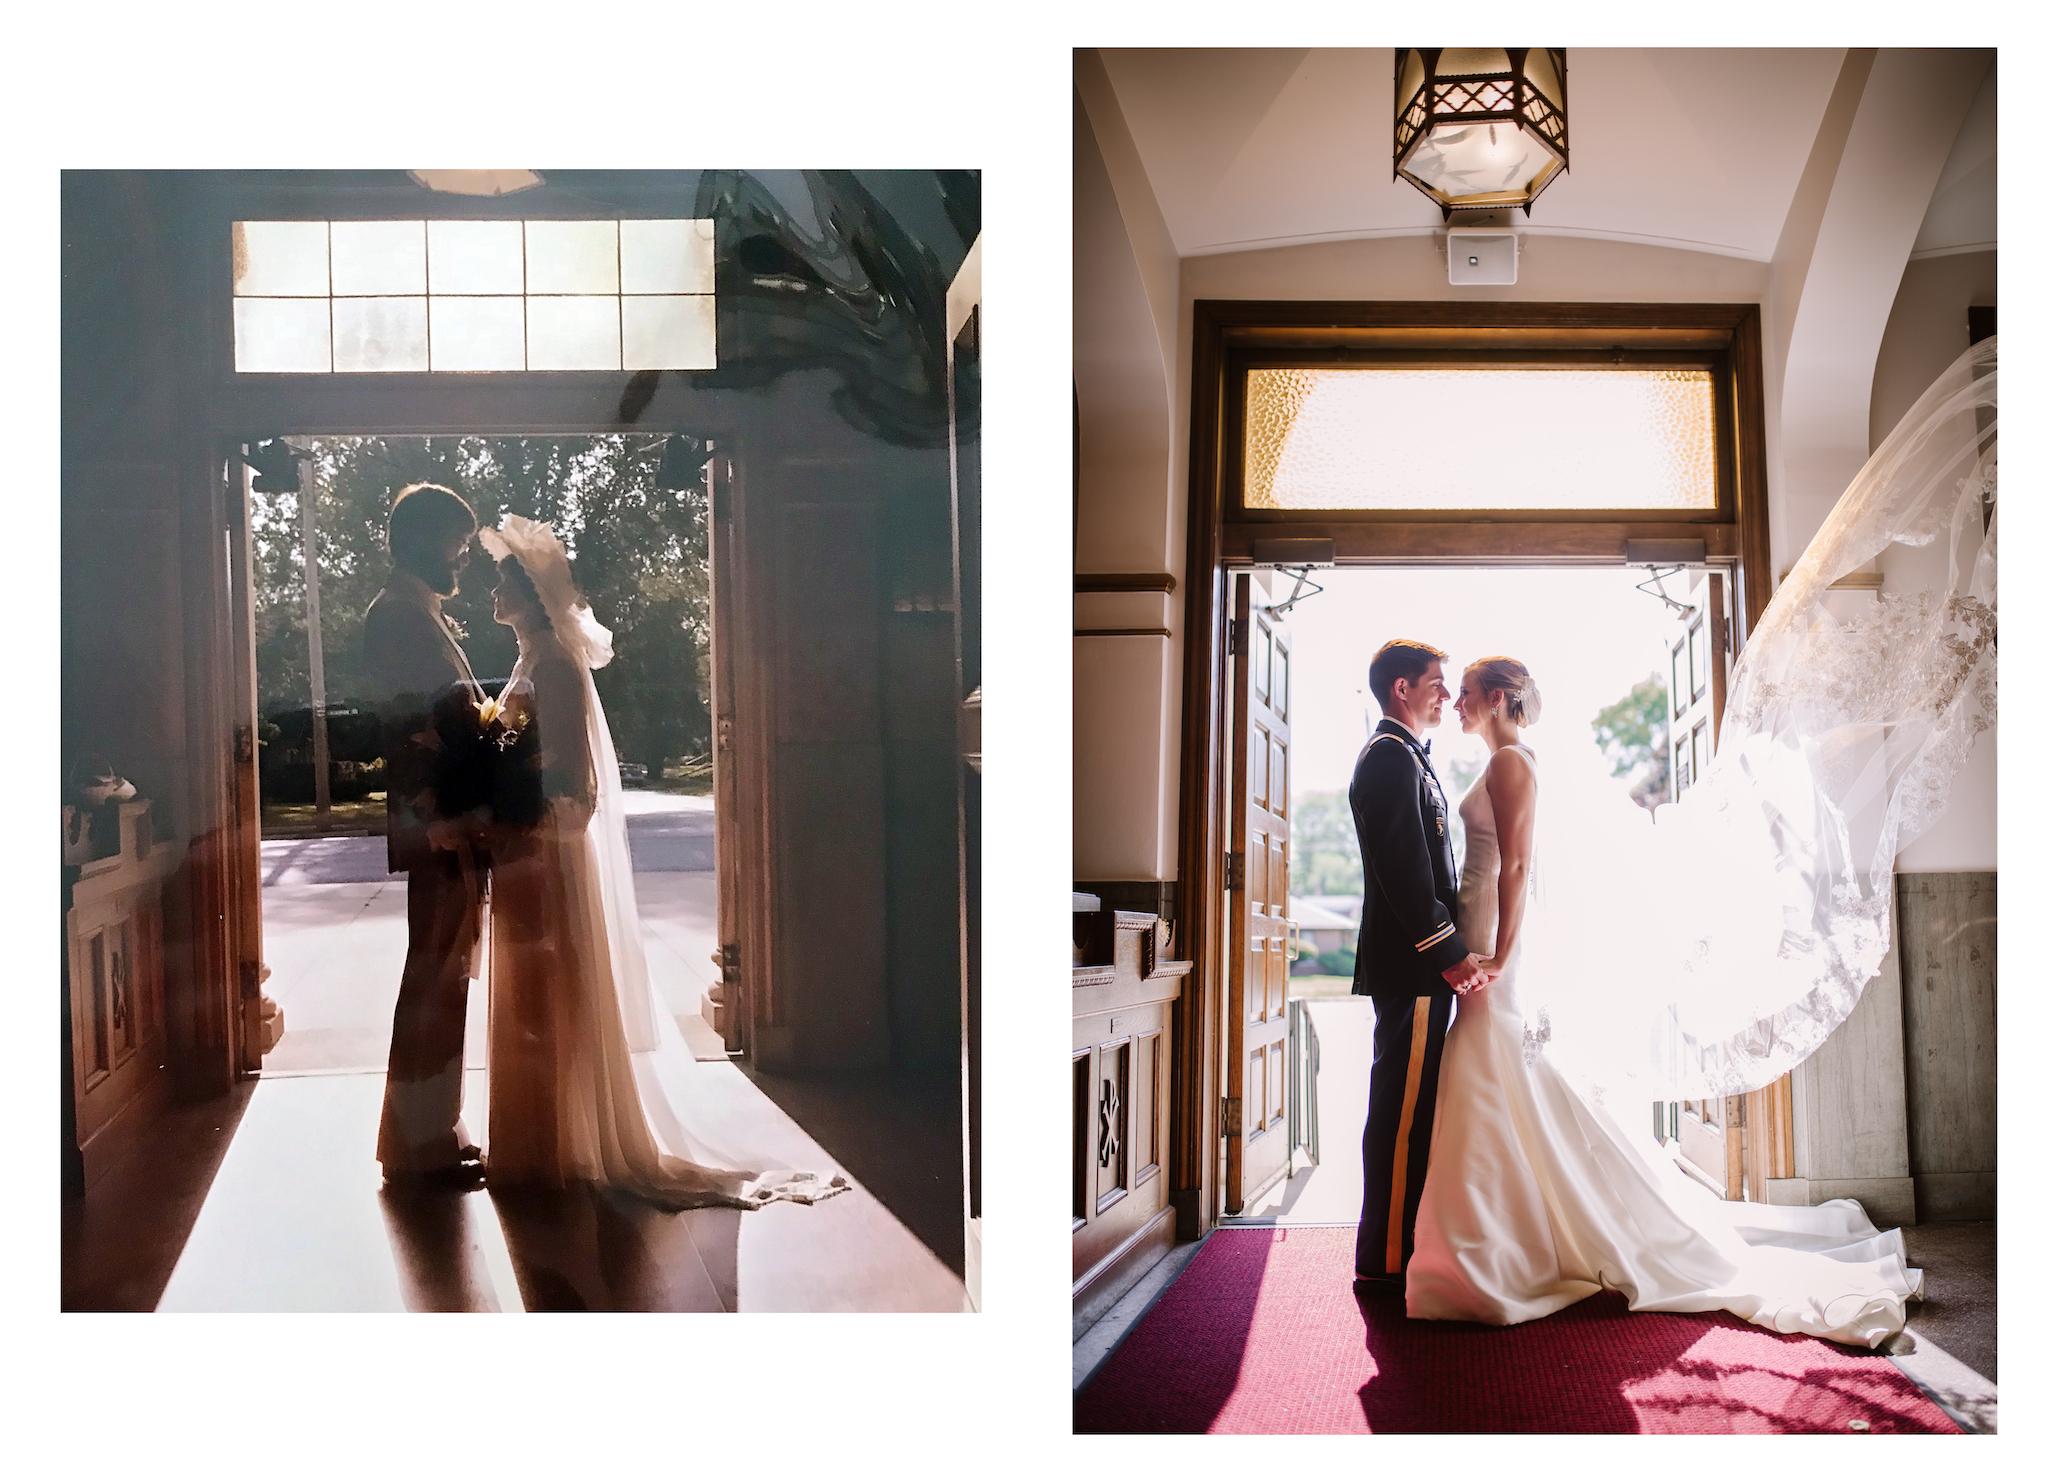 bride-and-groom-copy-same-photo-parents-took.jpg